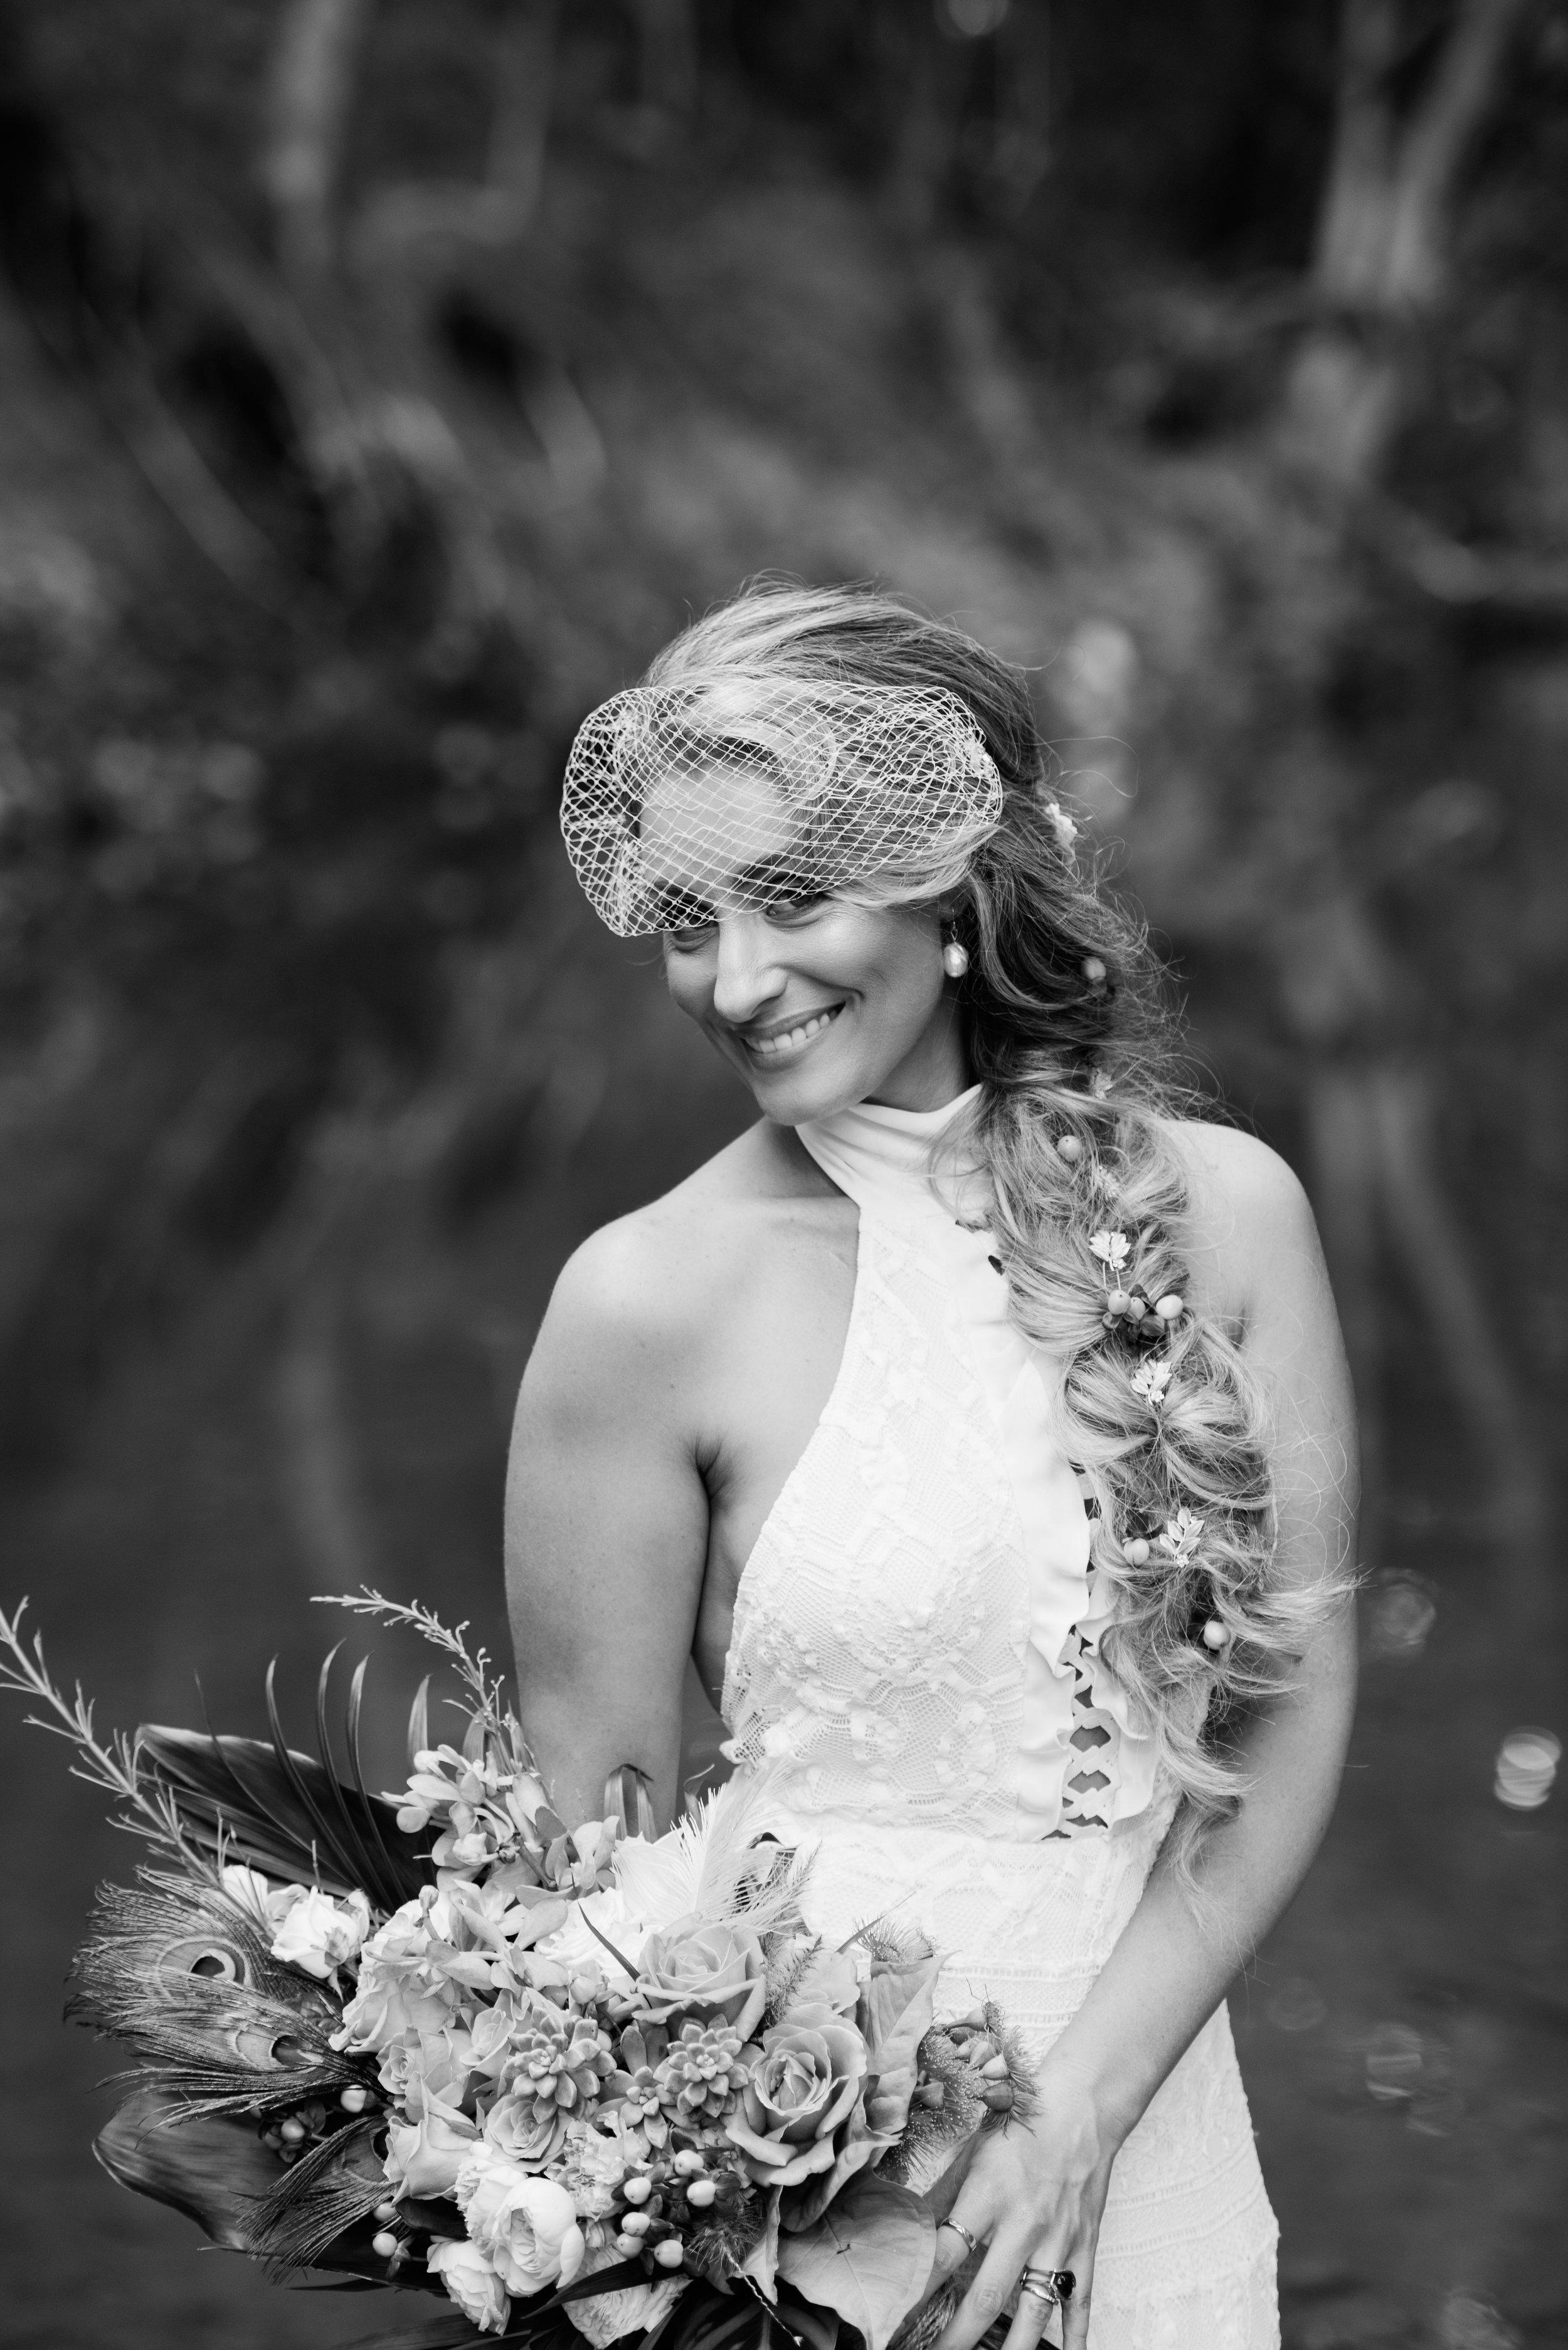 leah and cliff- skyla sage photography   wedding photographer, byron bay wedding and family photographer, tweed heads wedding and family photography-224.jpg